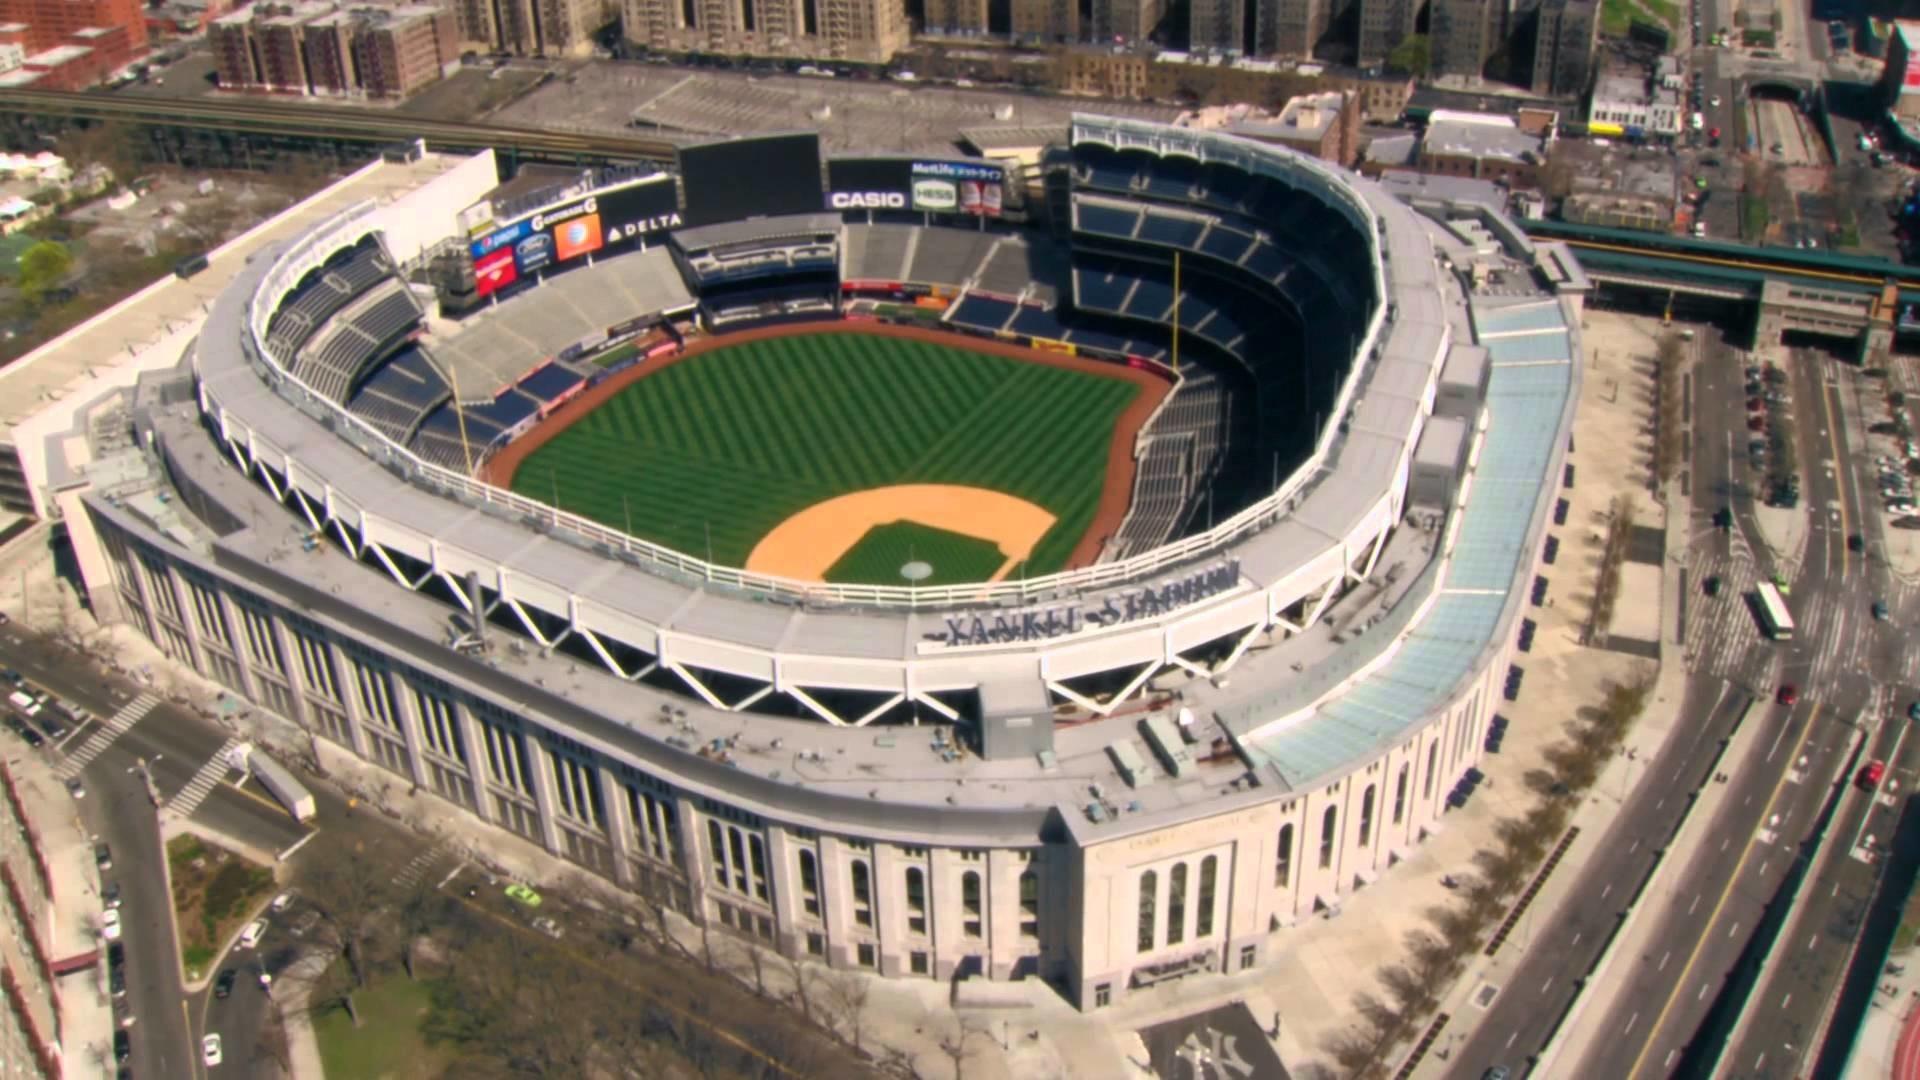 2246x1498 Wallpaperwiki HD Free Dodger Stadium Pictures PIC